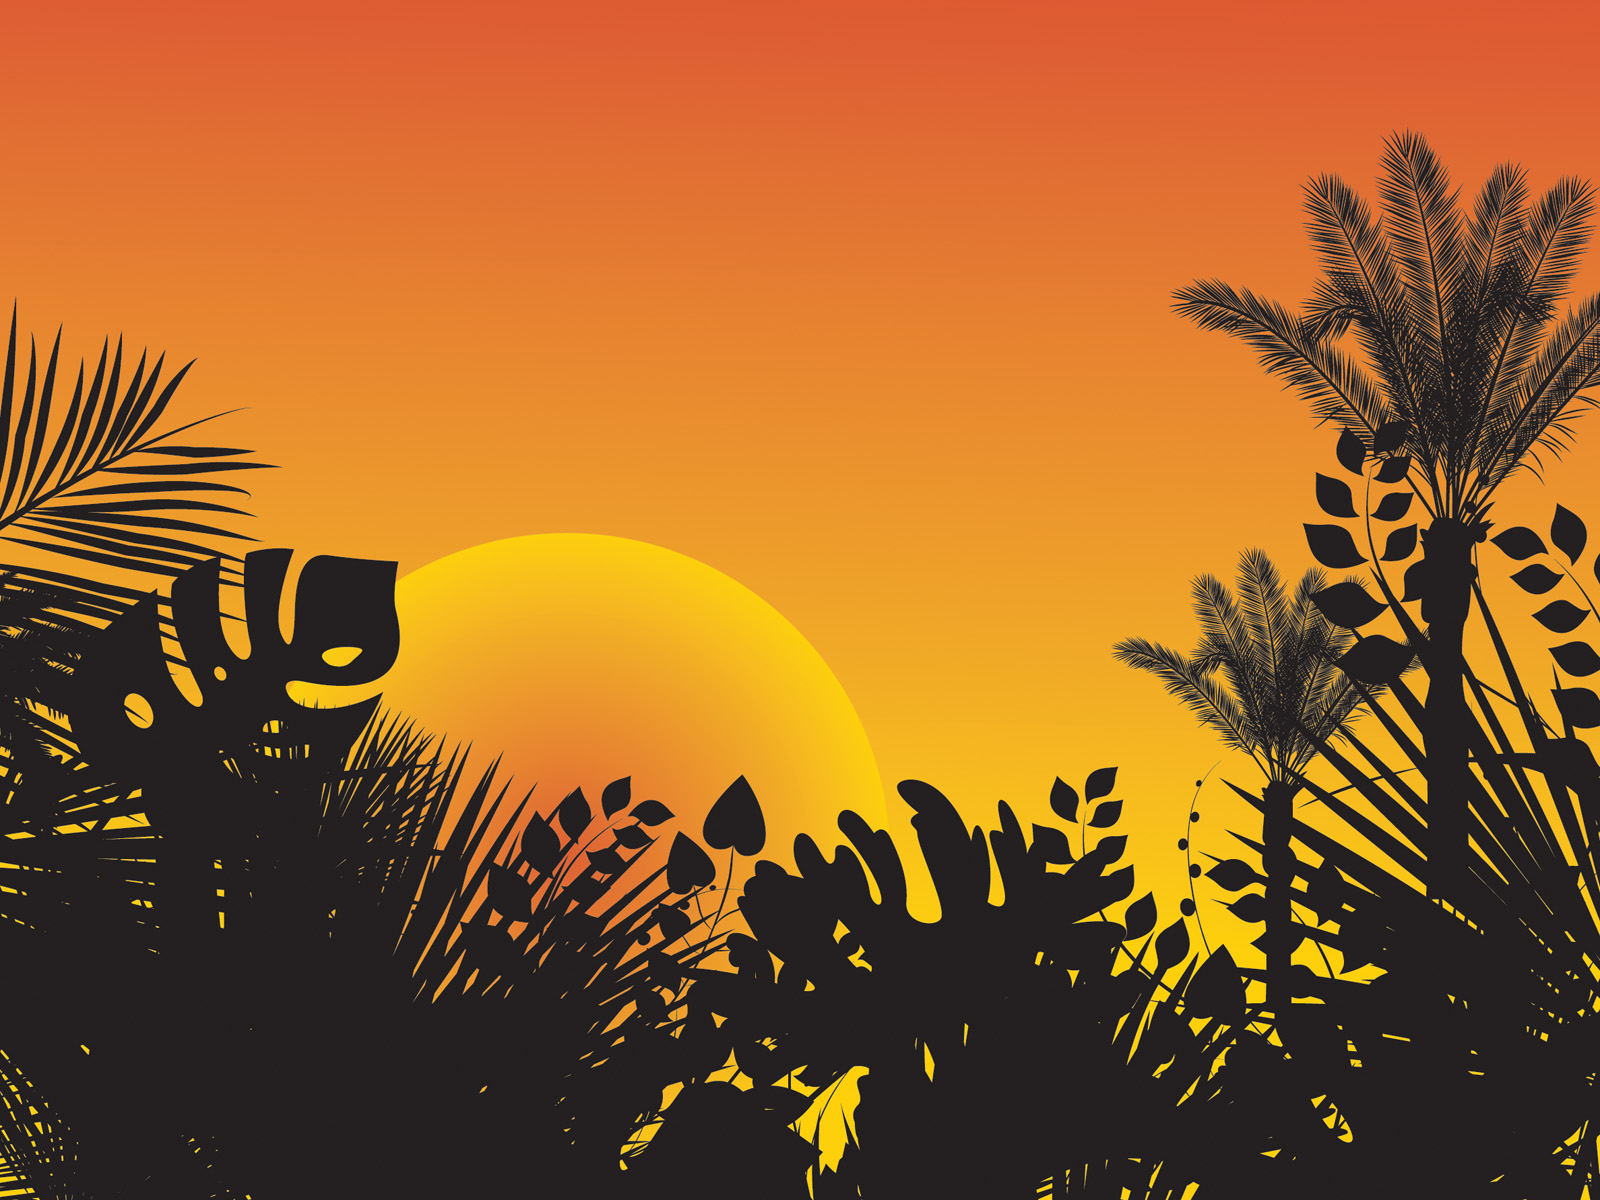 Tropical Sunset Design Ppt Backgrounds Design Templates